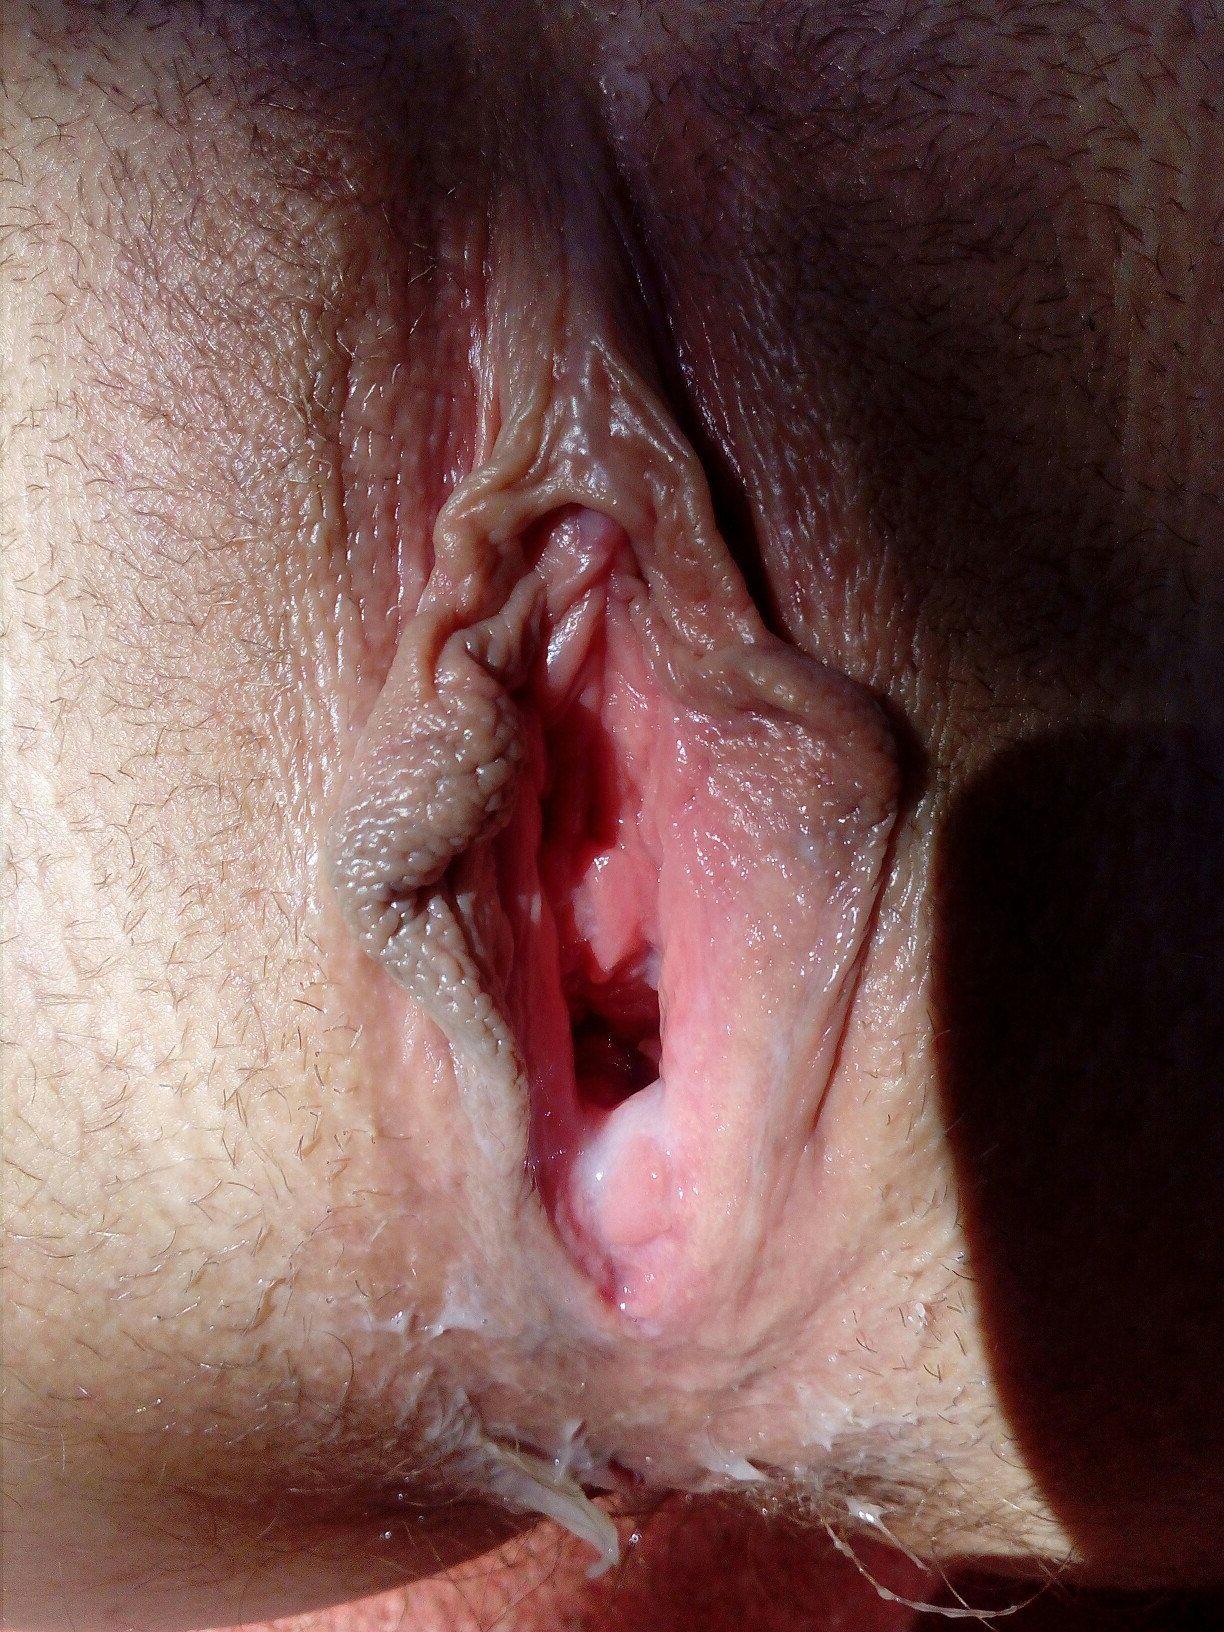 вагина после коитуса крупный план фото